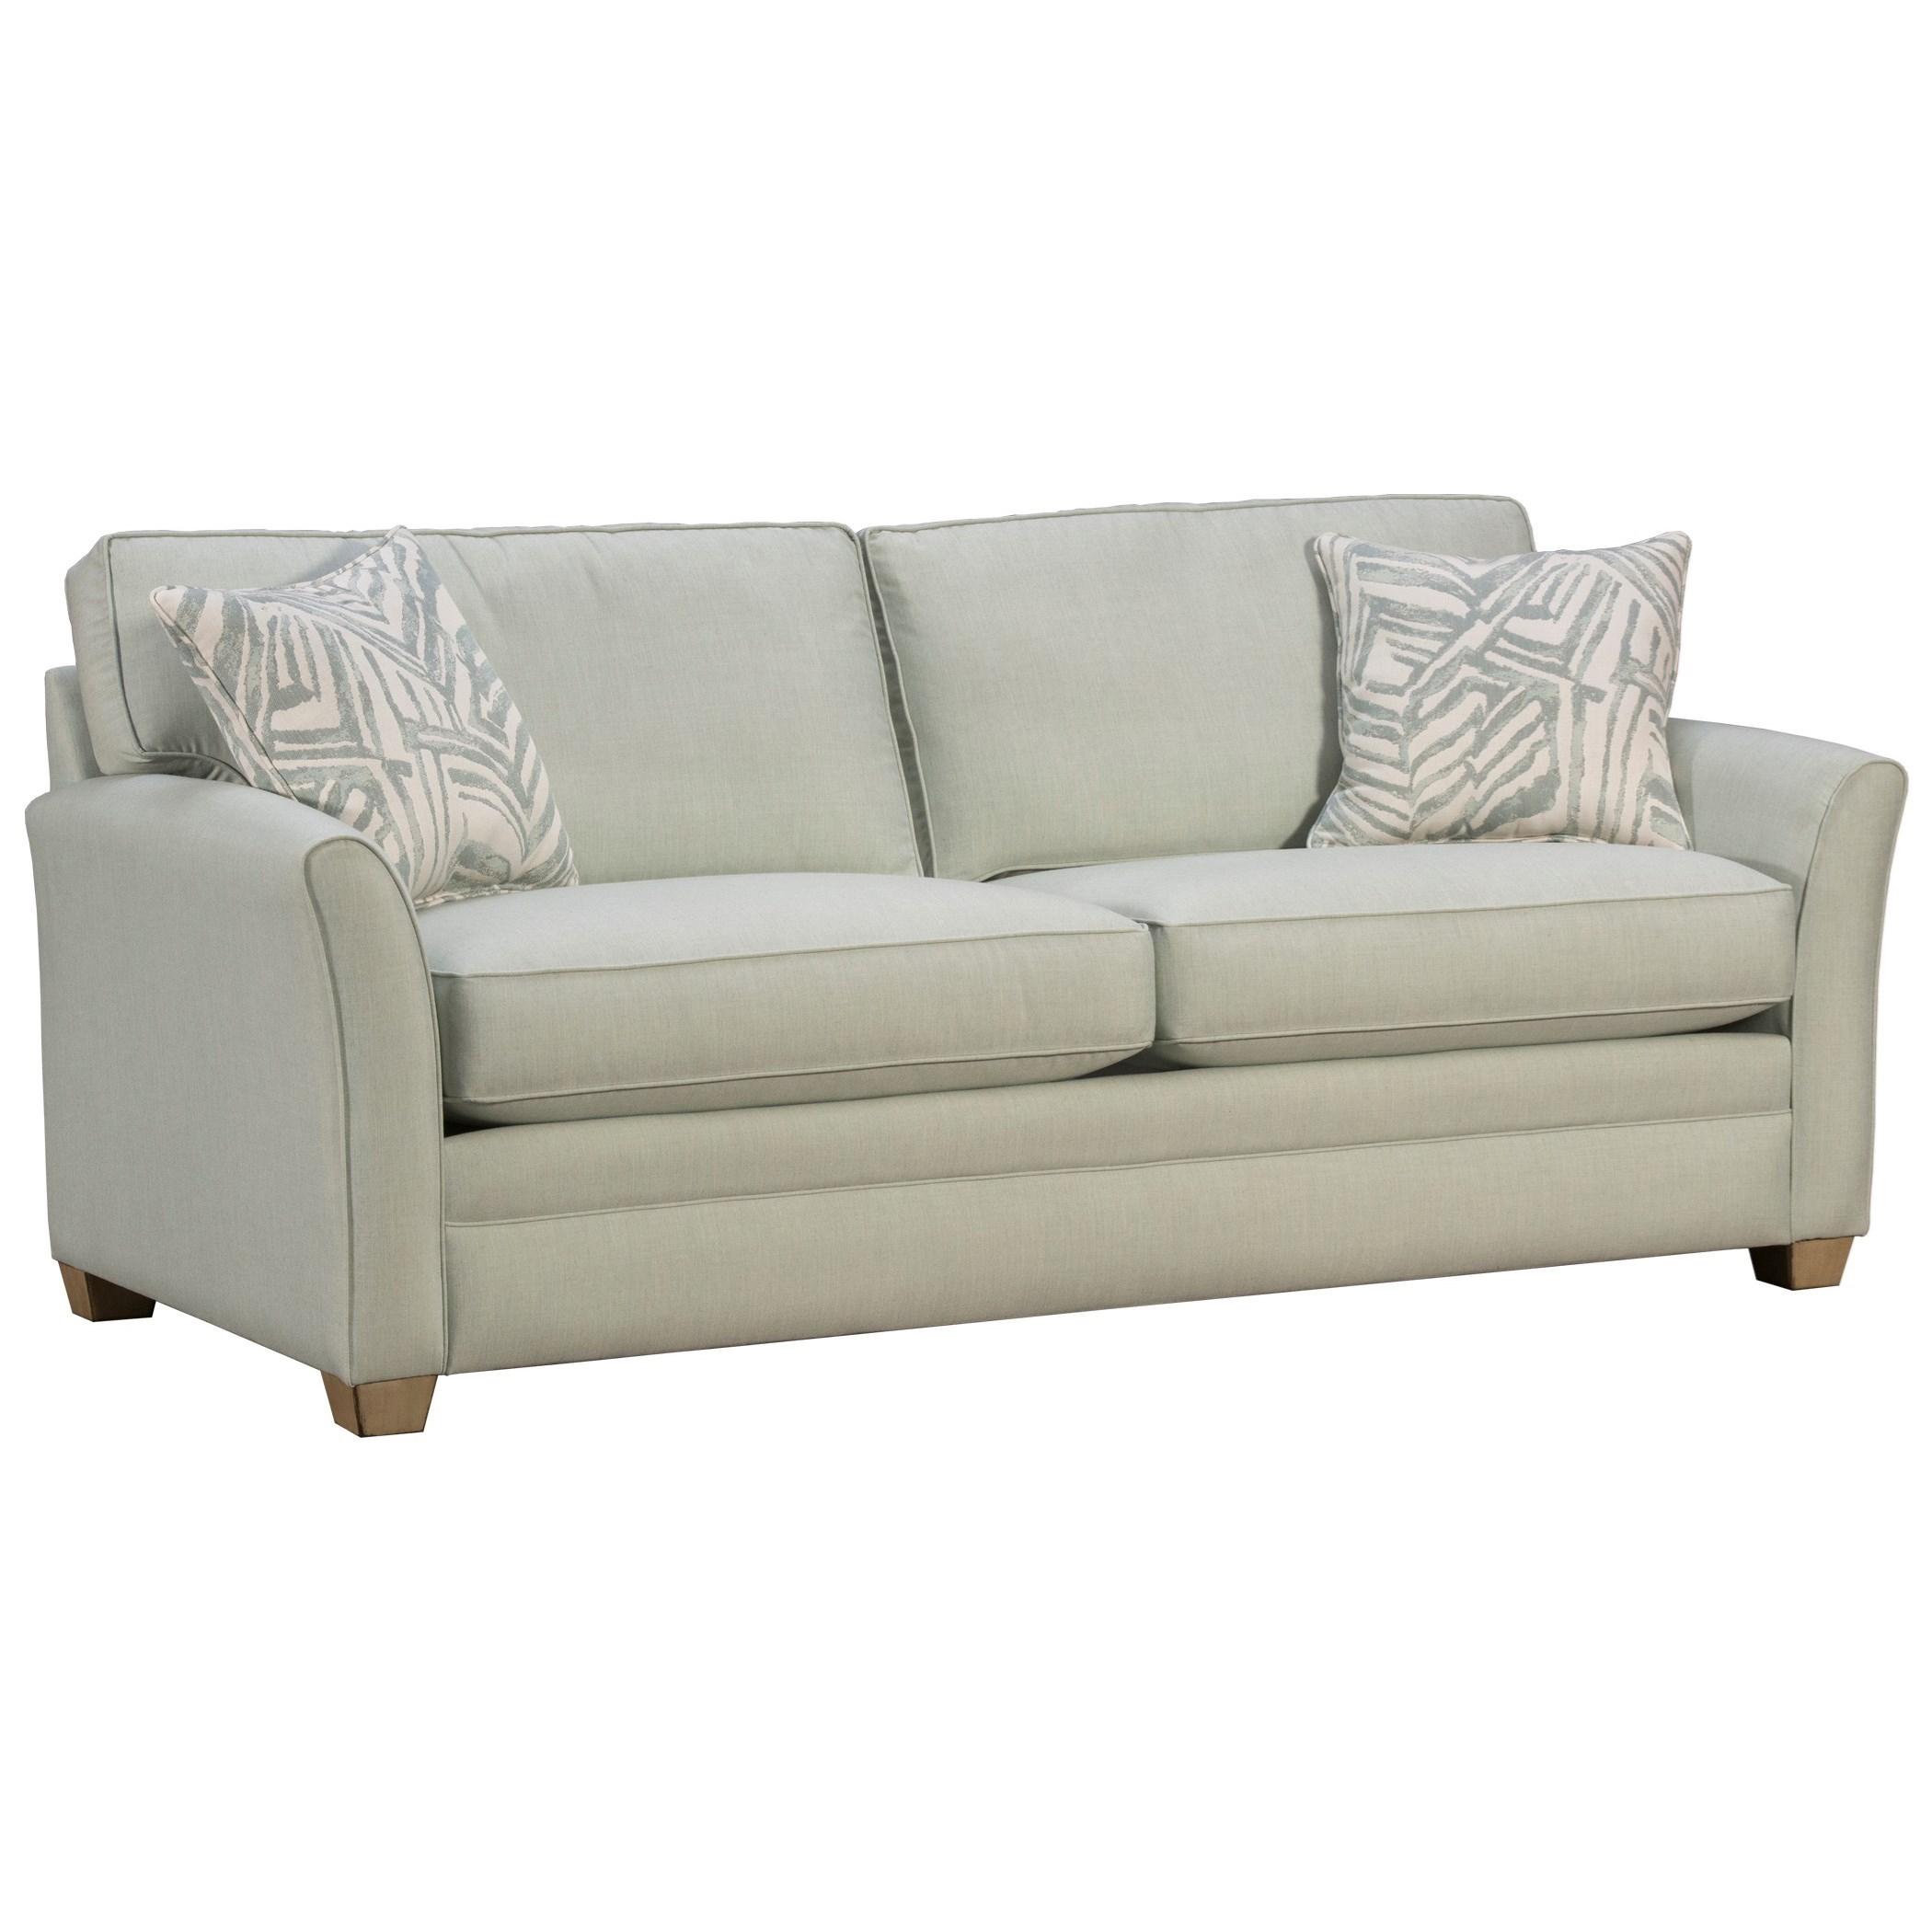 202 Sleeper Sofa by Capris Furniture at Esprit Decor Home Furnishings